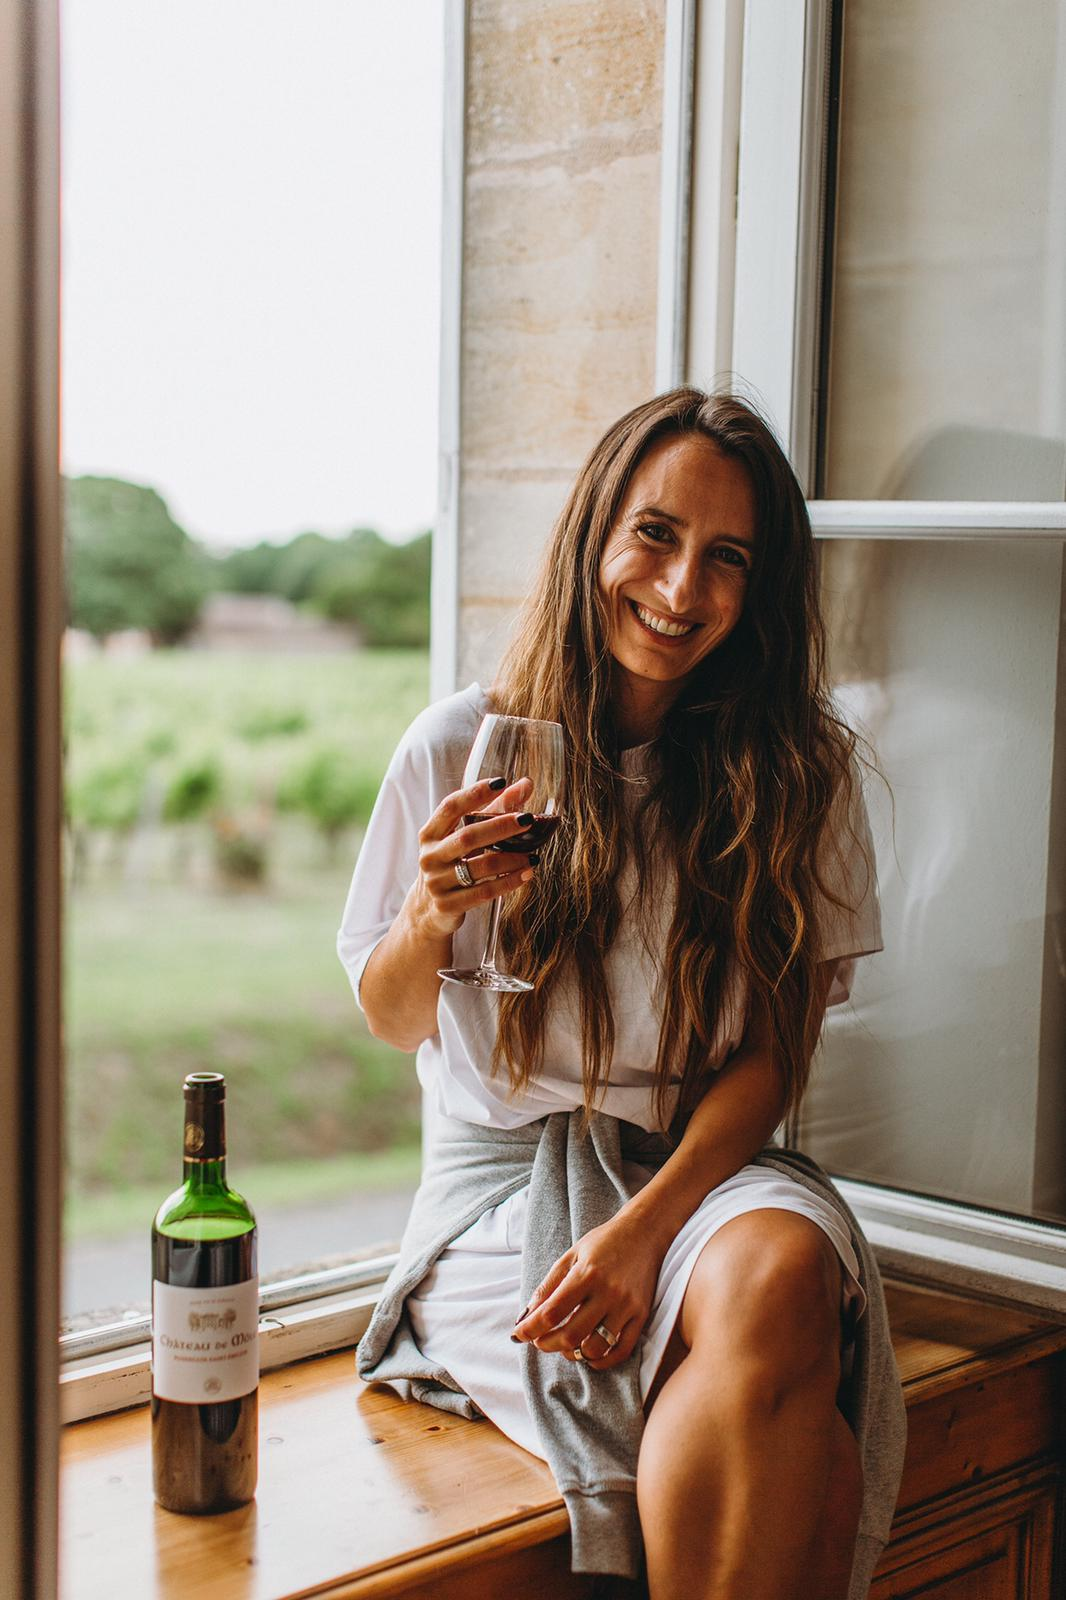 Bordeaux Wein lädt ein – Santé